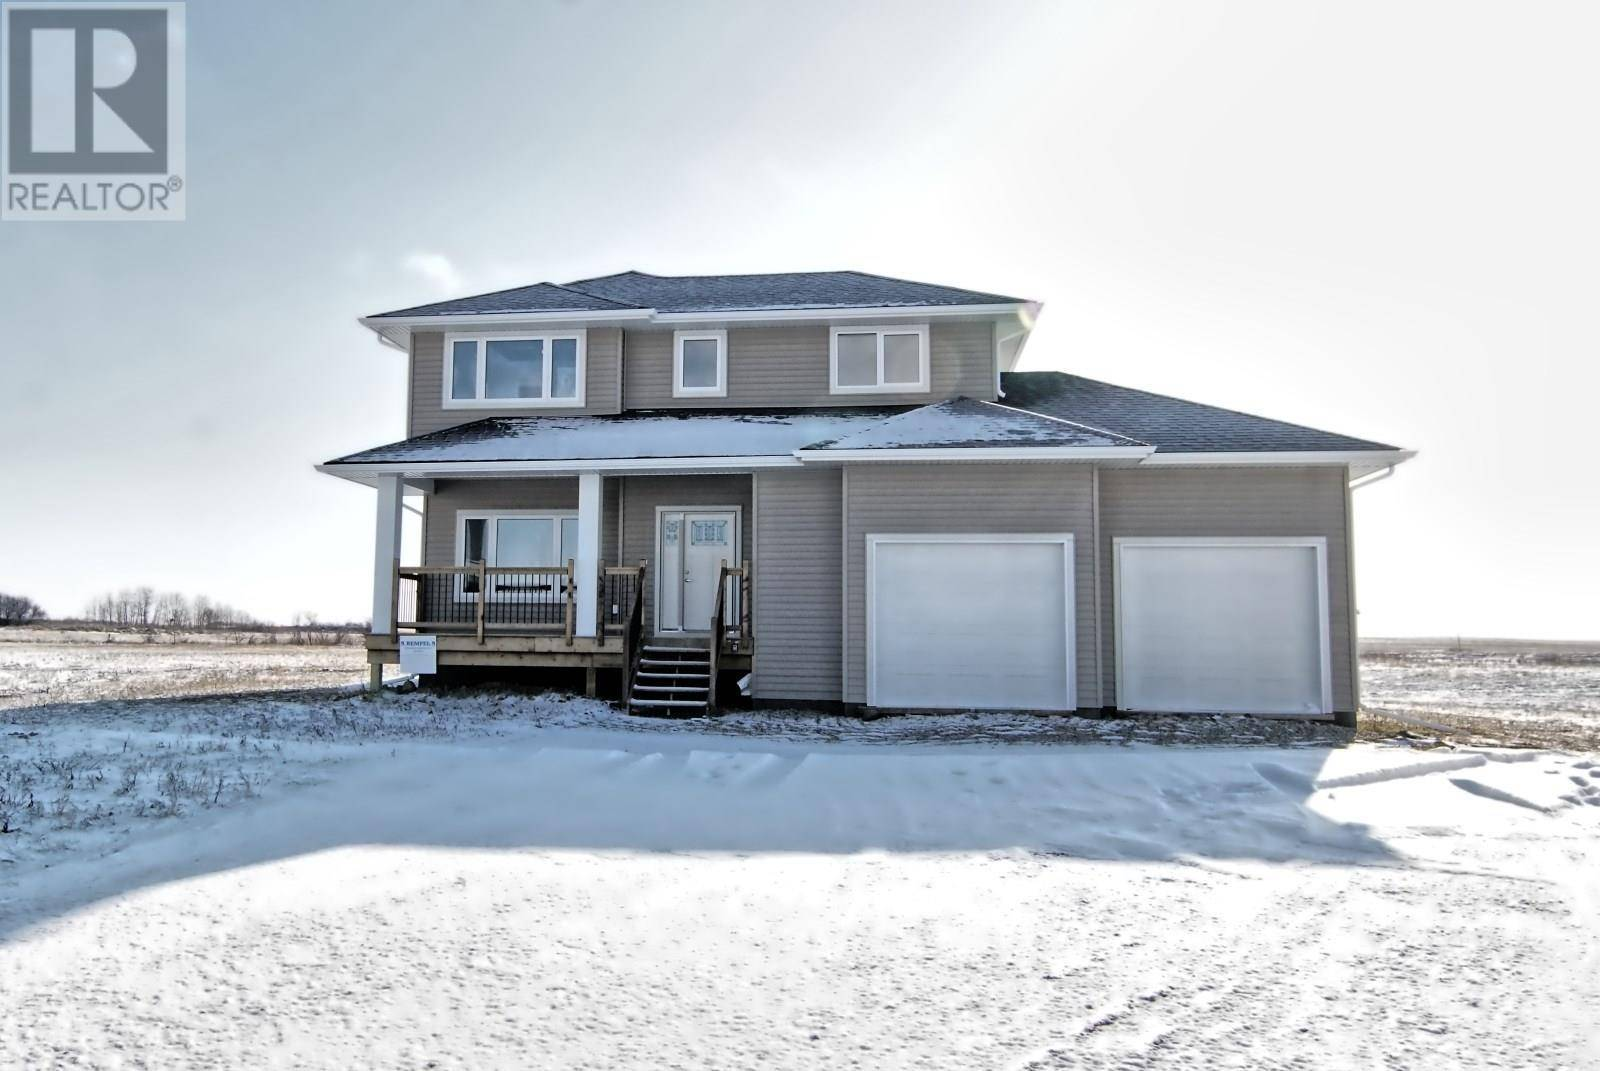 House for sale at 64 Meadowlark Cres Blucher Rm No. 343 Saskatchewan - MLS: SK758753